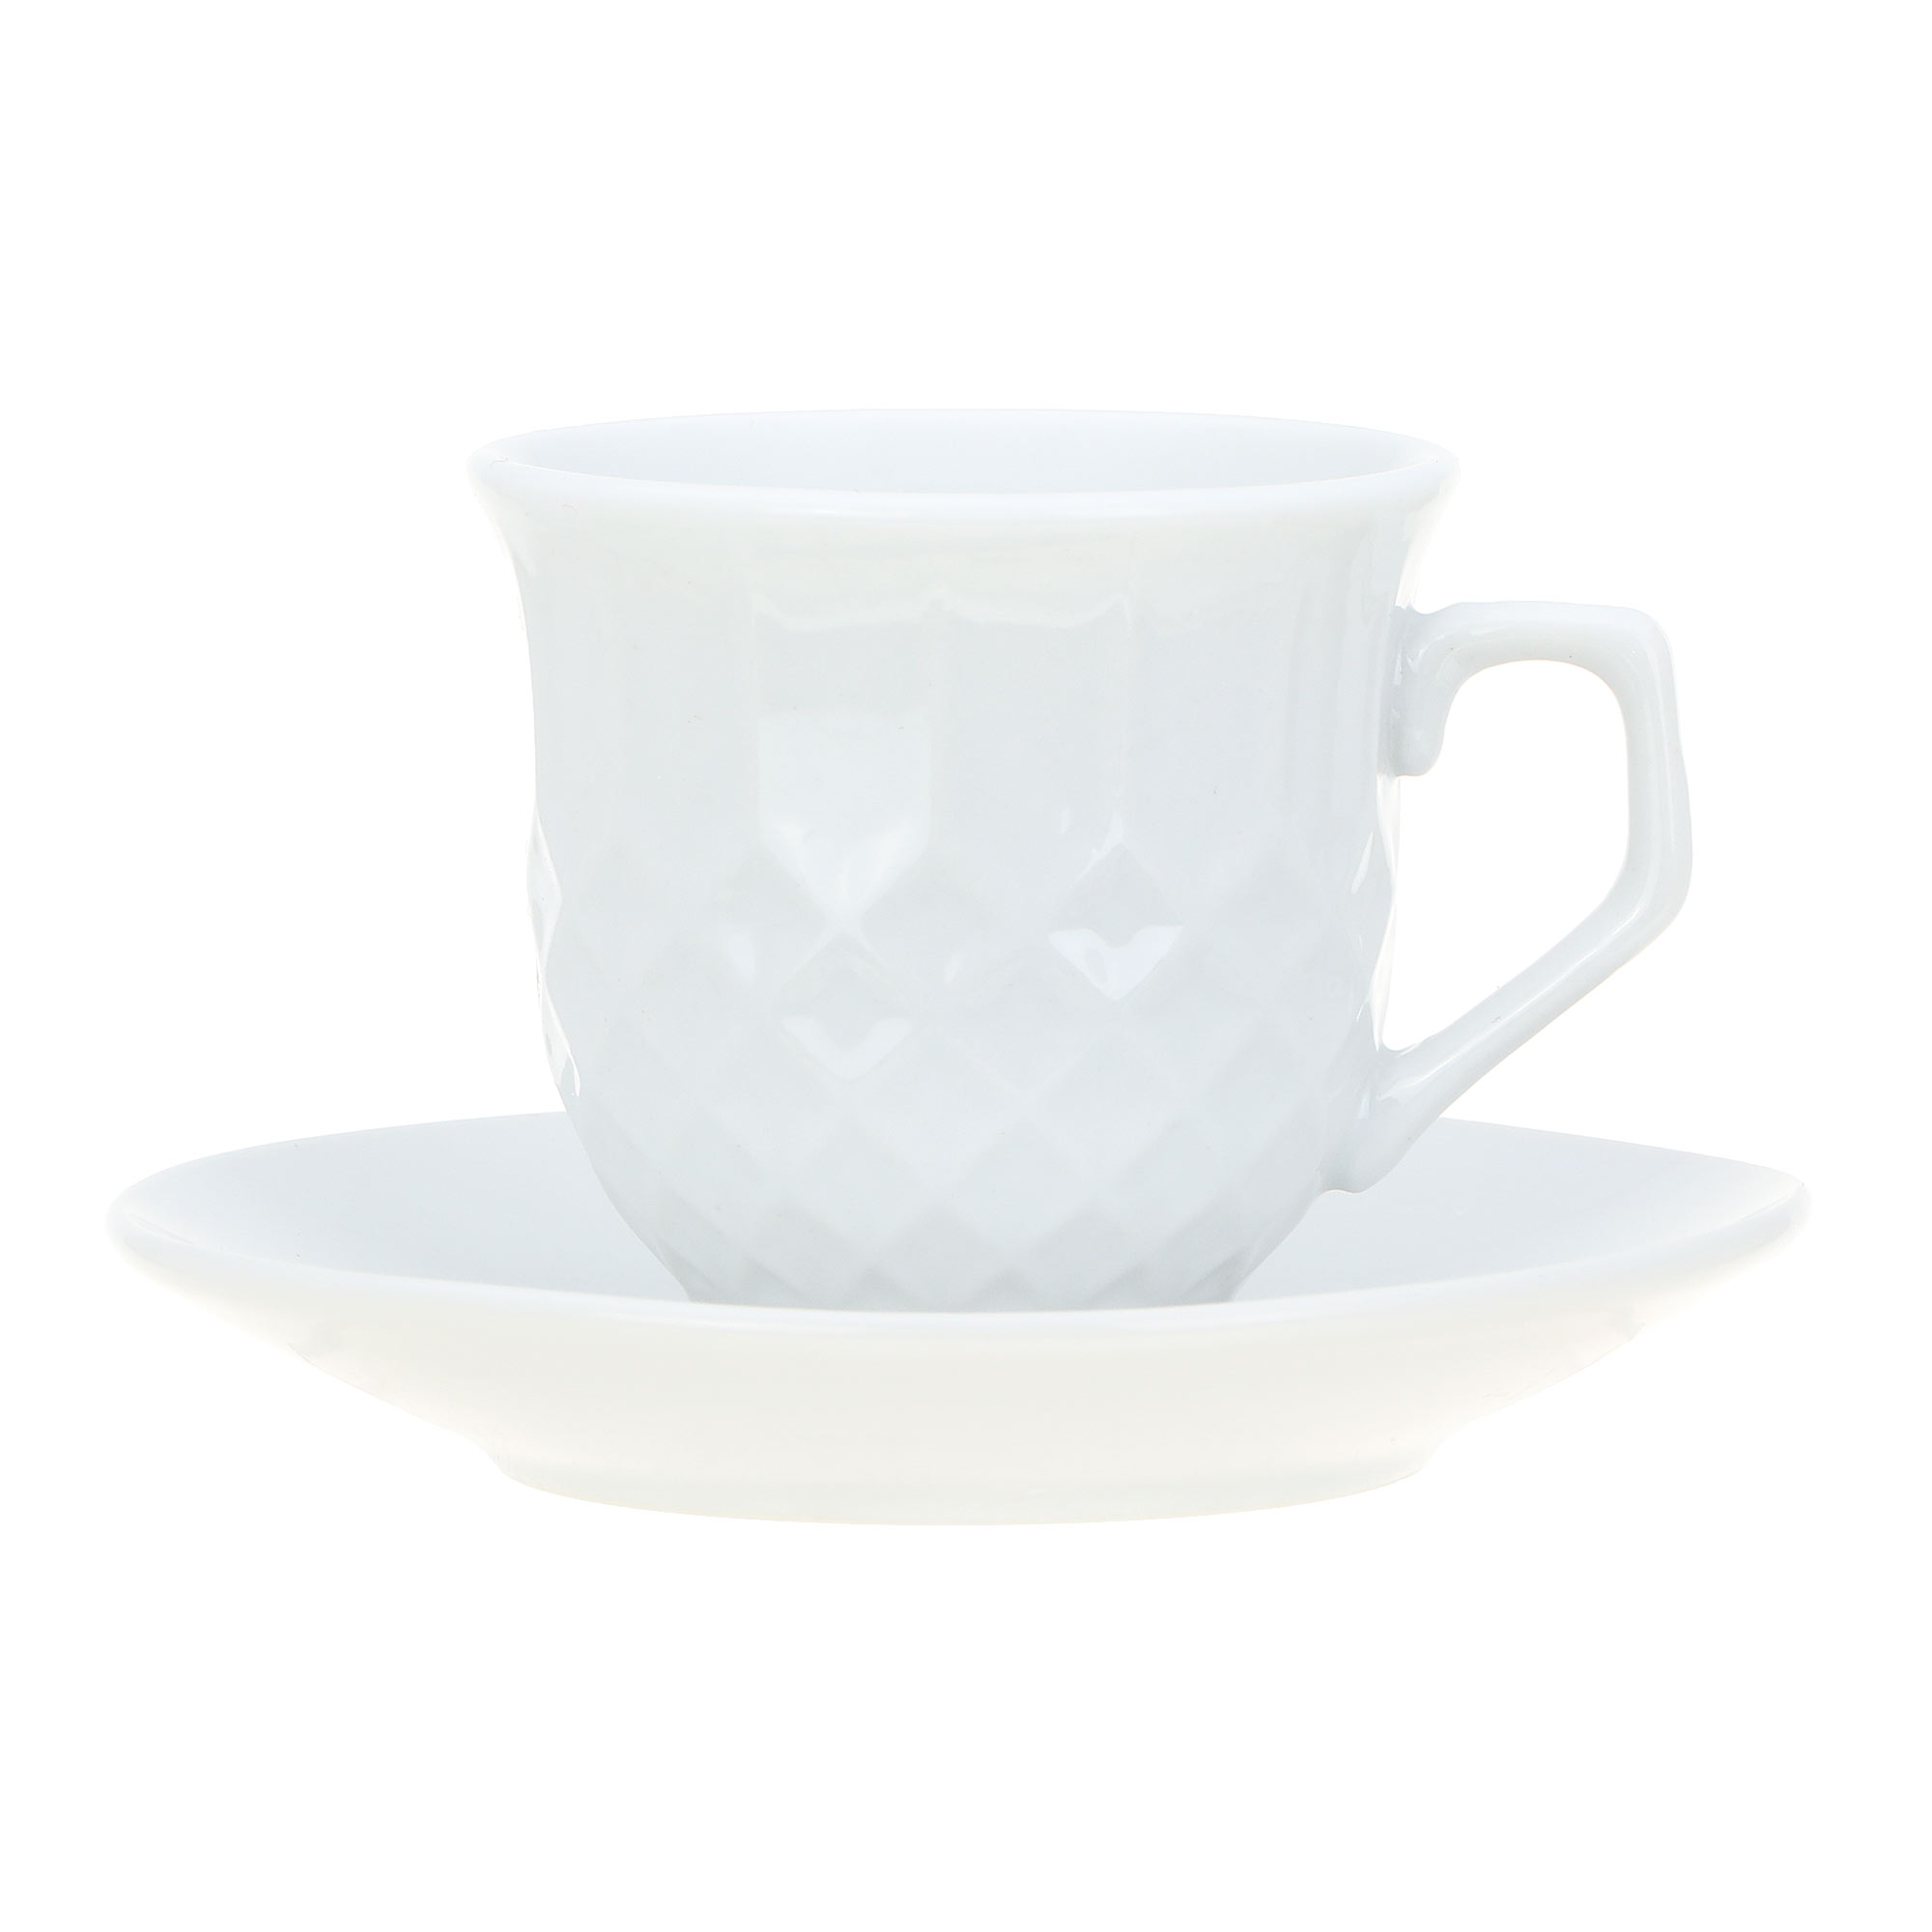 Сервиз кофейный Ad trend на 6 персон